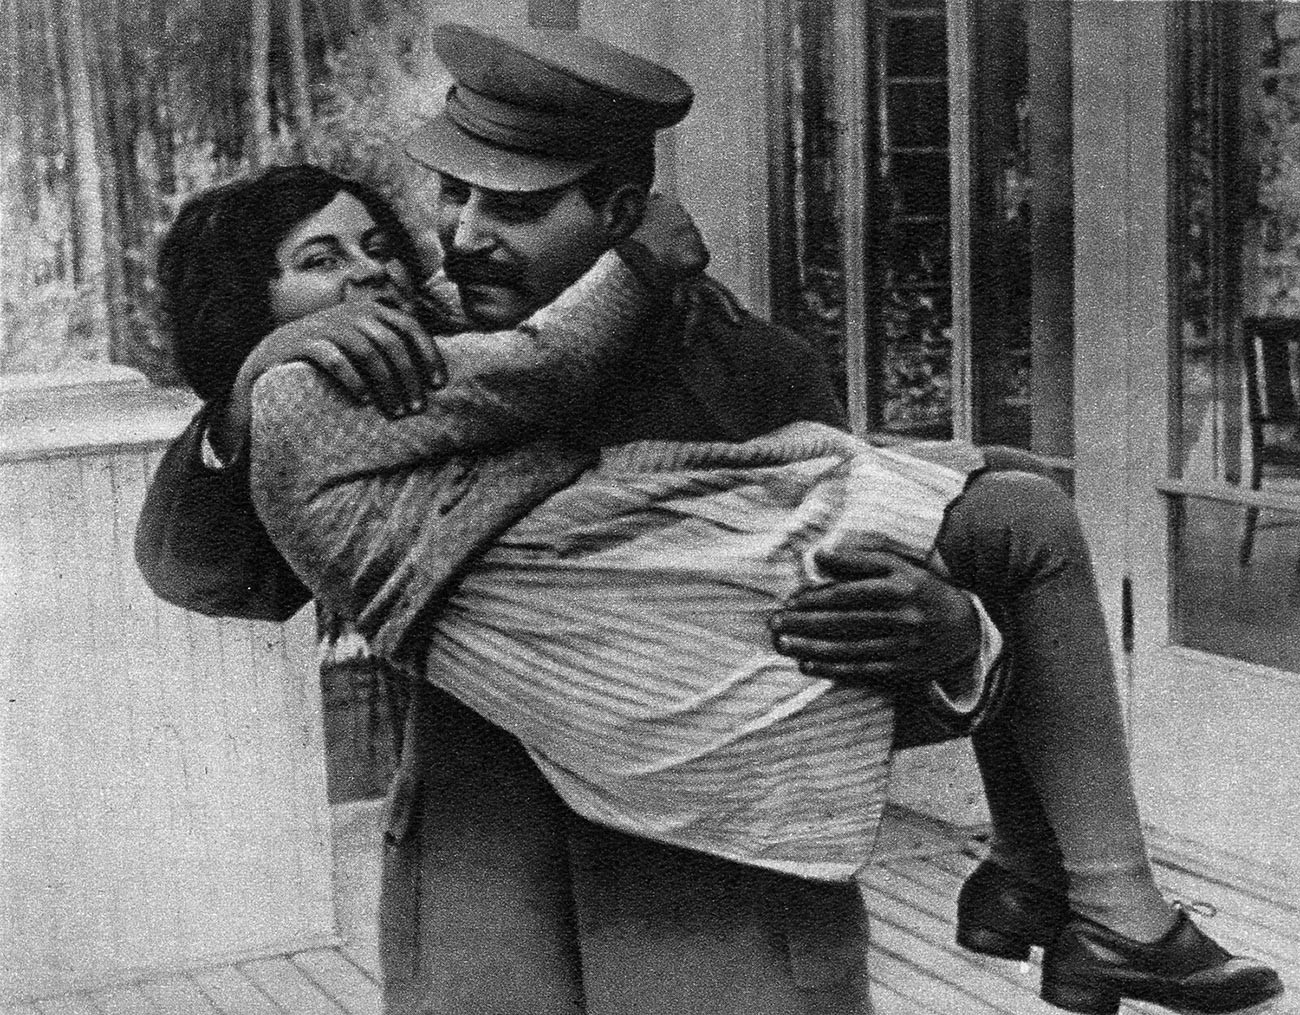 Joseph Stalin menggendong putrinya Svetlana dengan kedua tangannya.